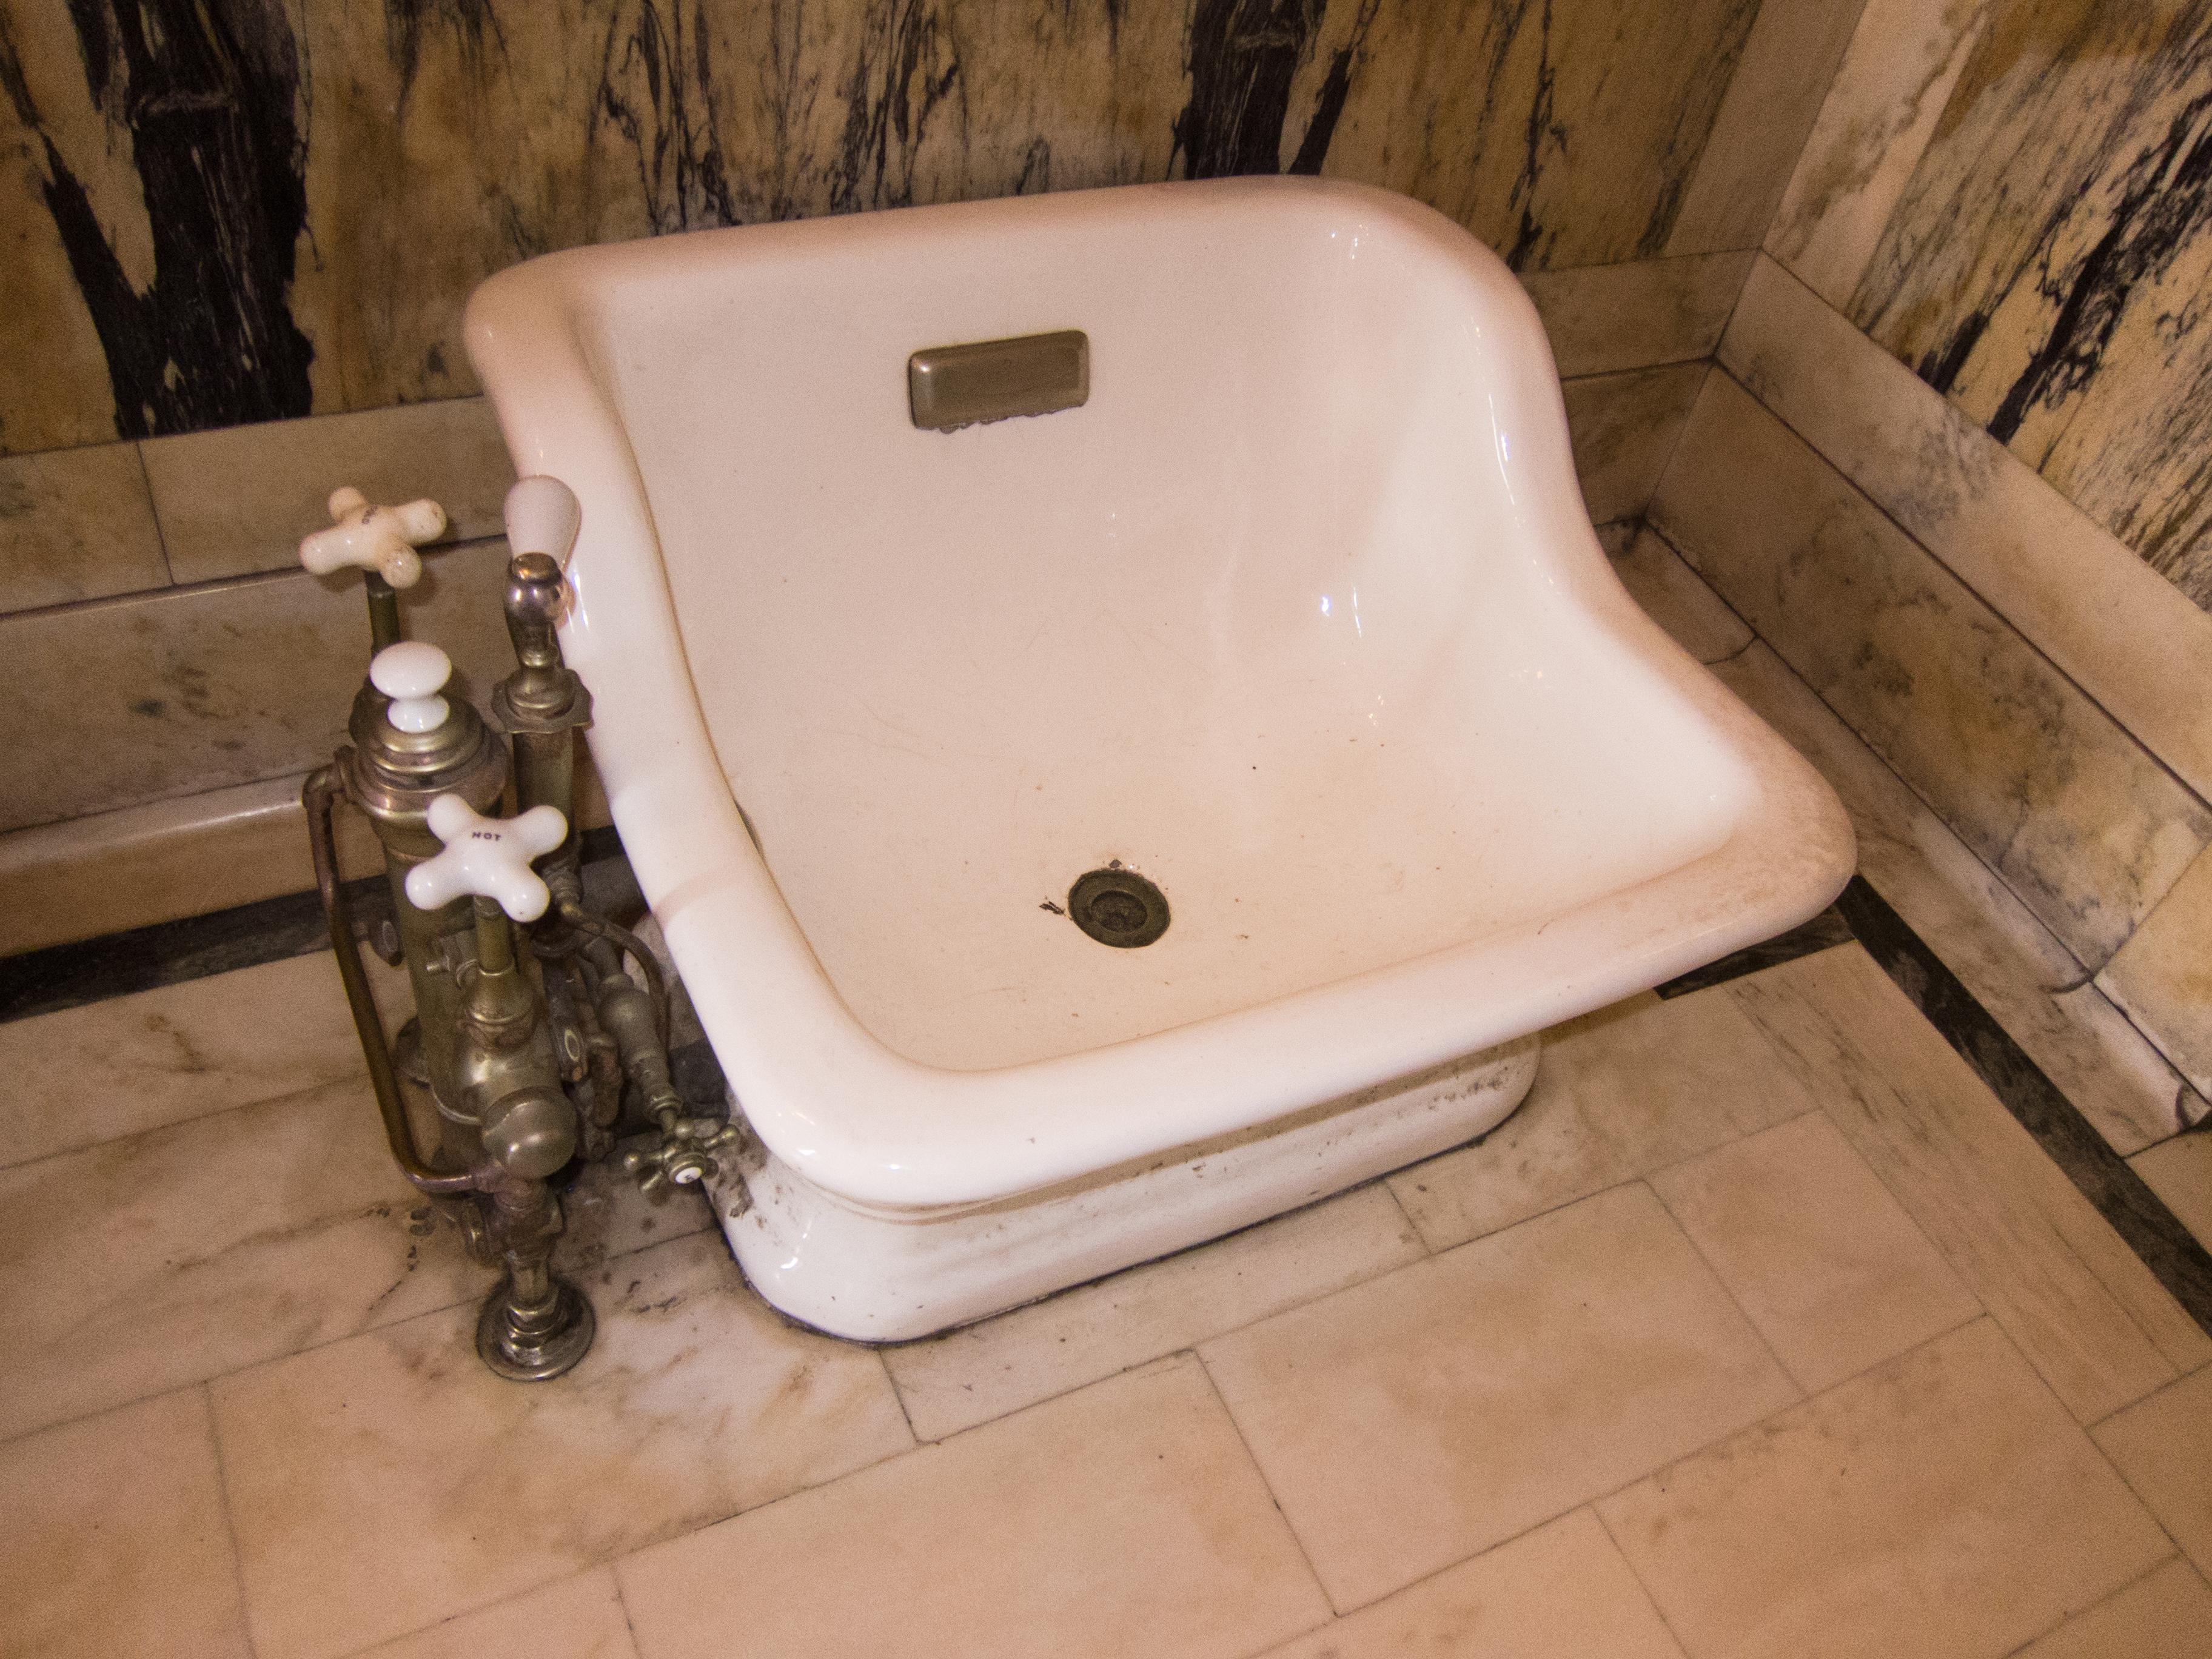 File:Antique foot bath - Casa Loma.jpg - Wikimedia Commons